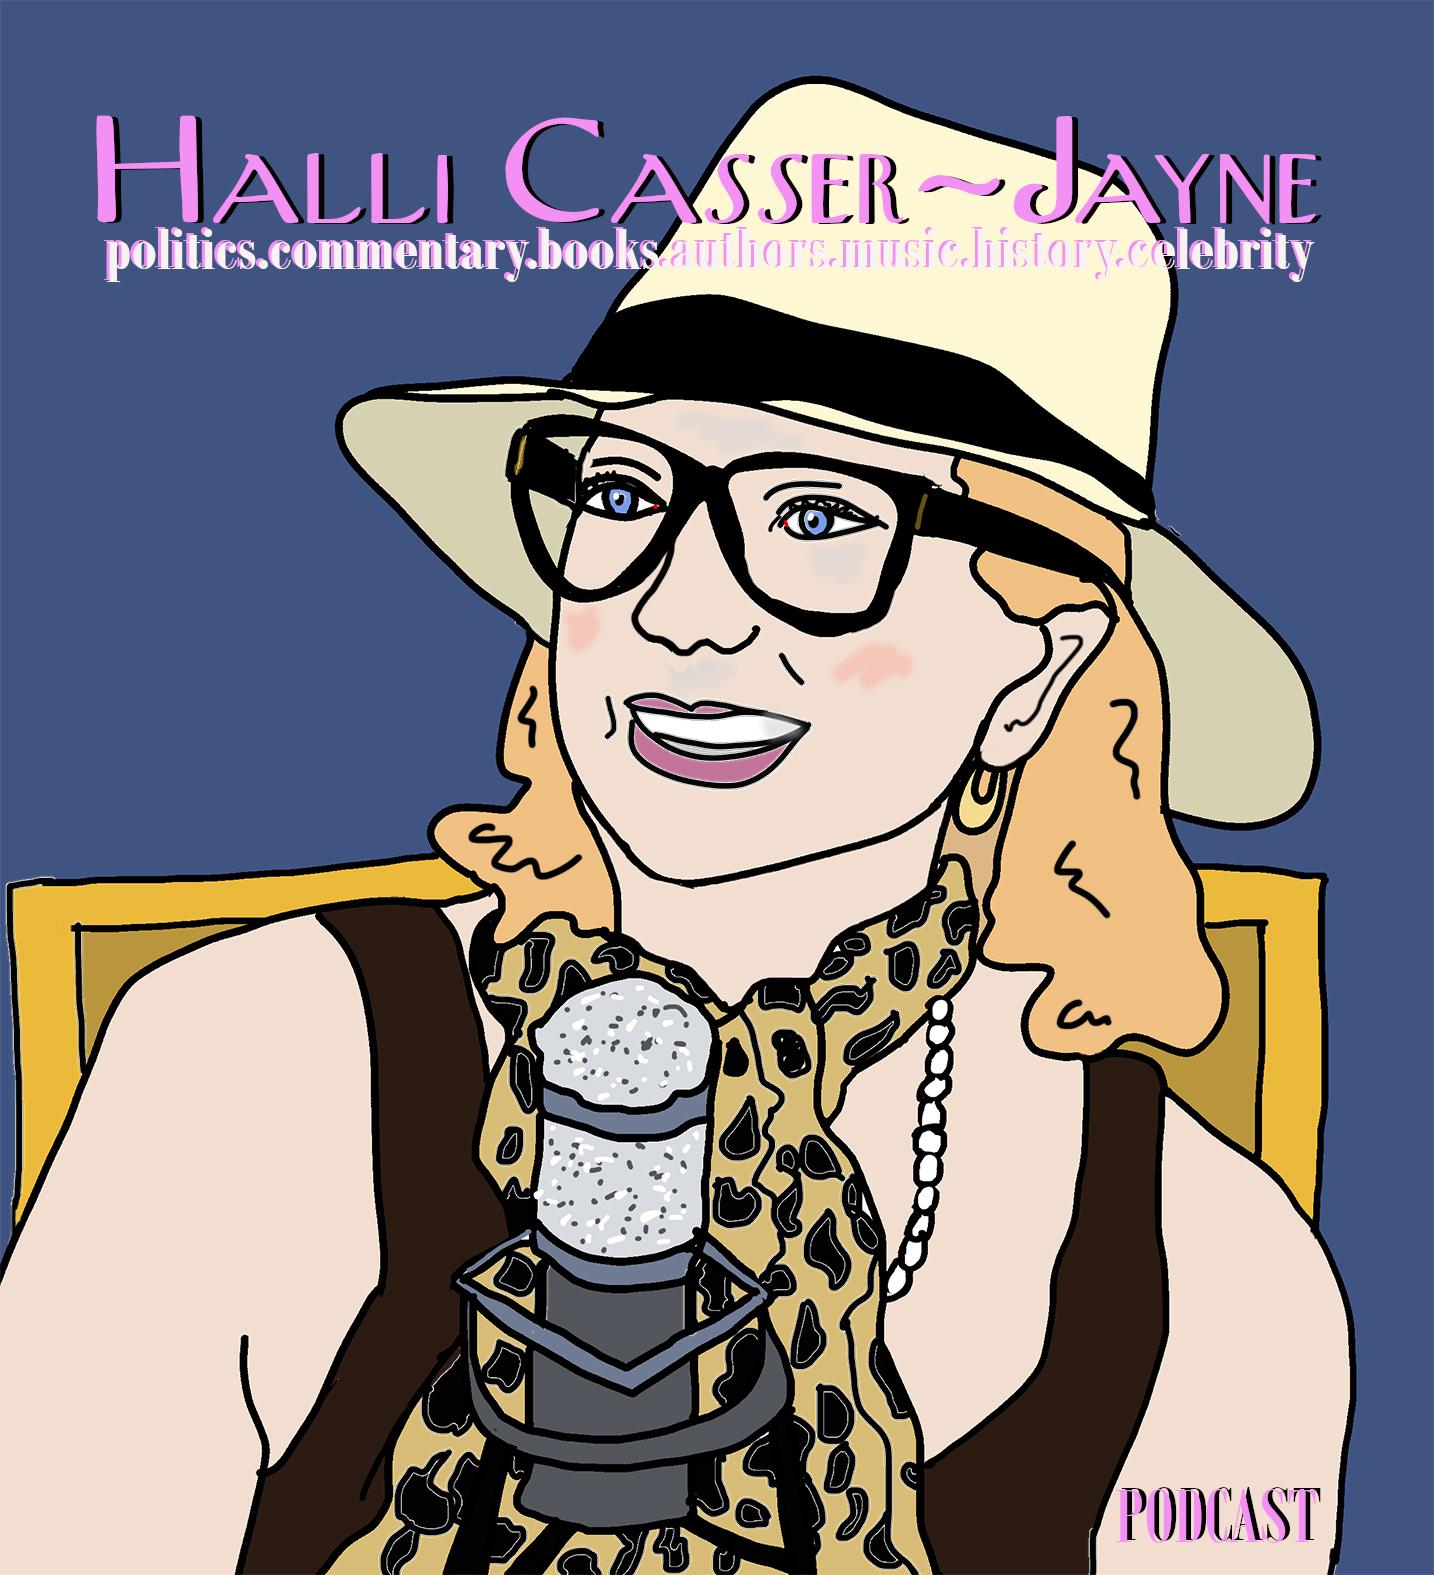 The Halli Casser-Jayne Show